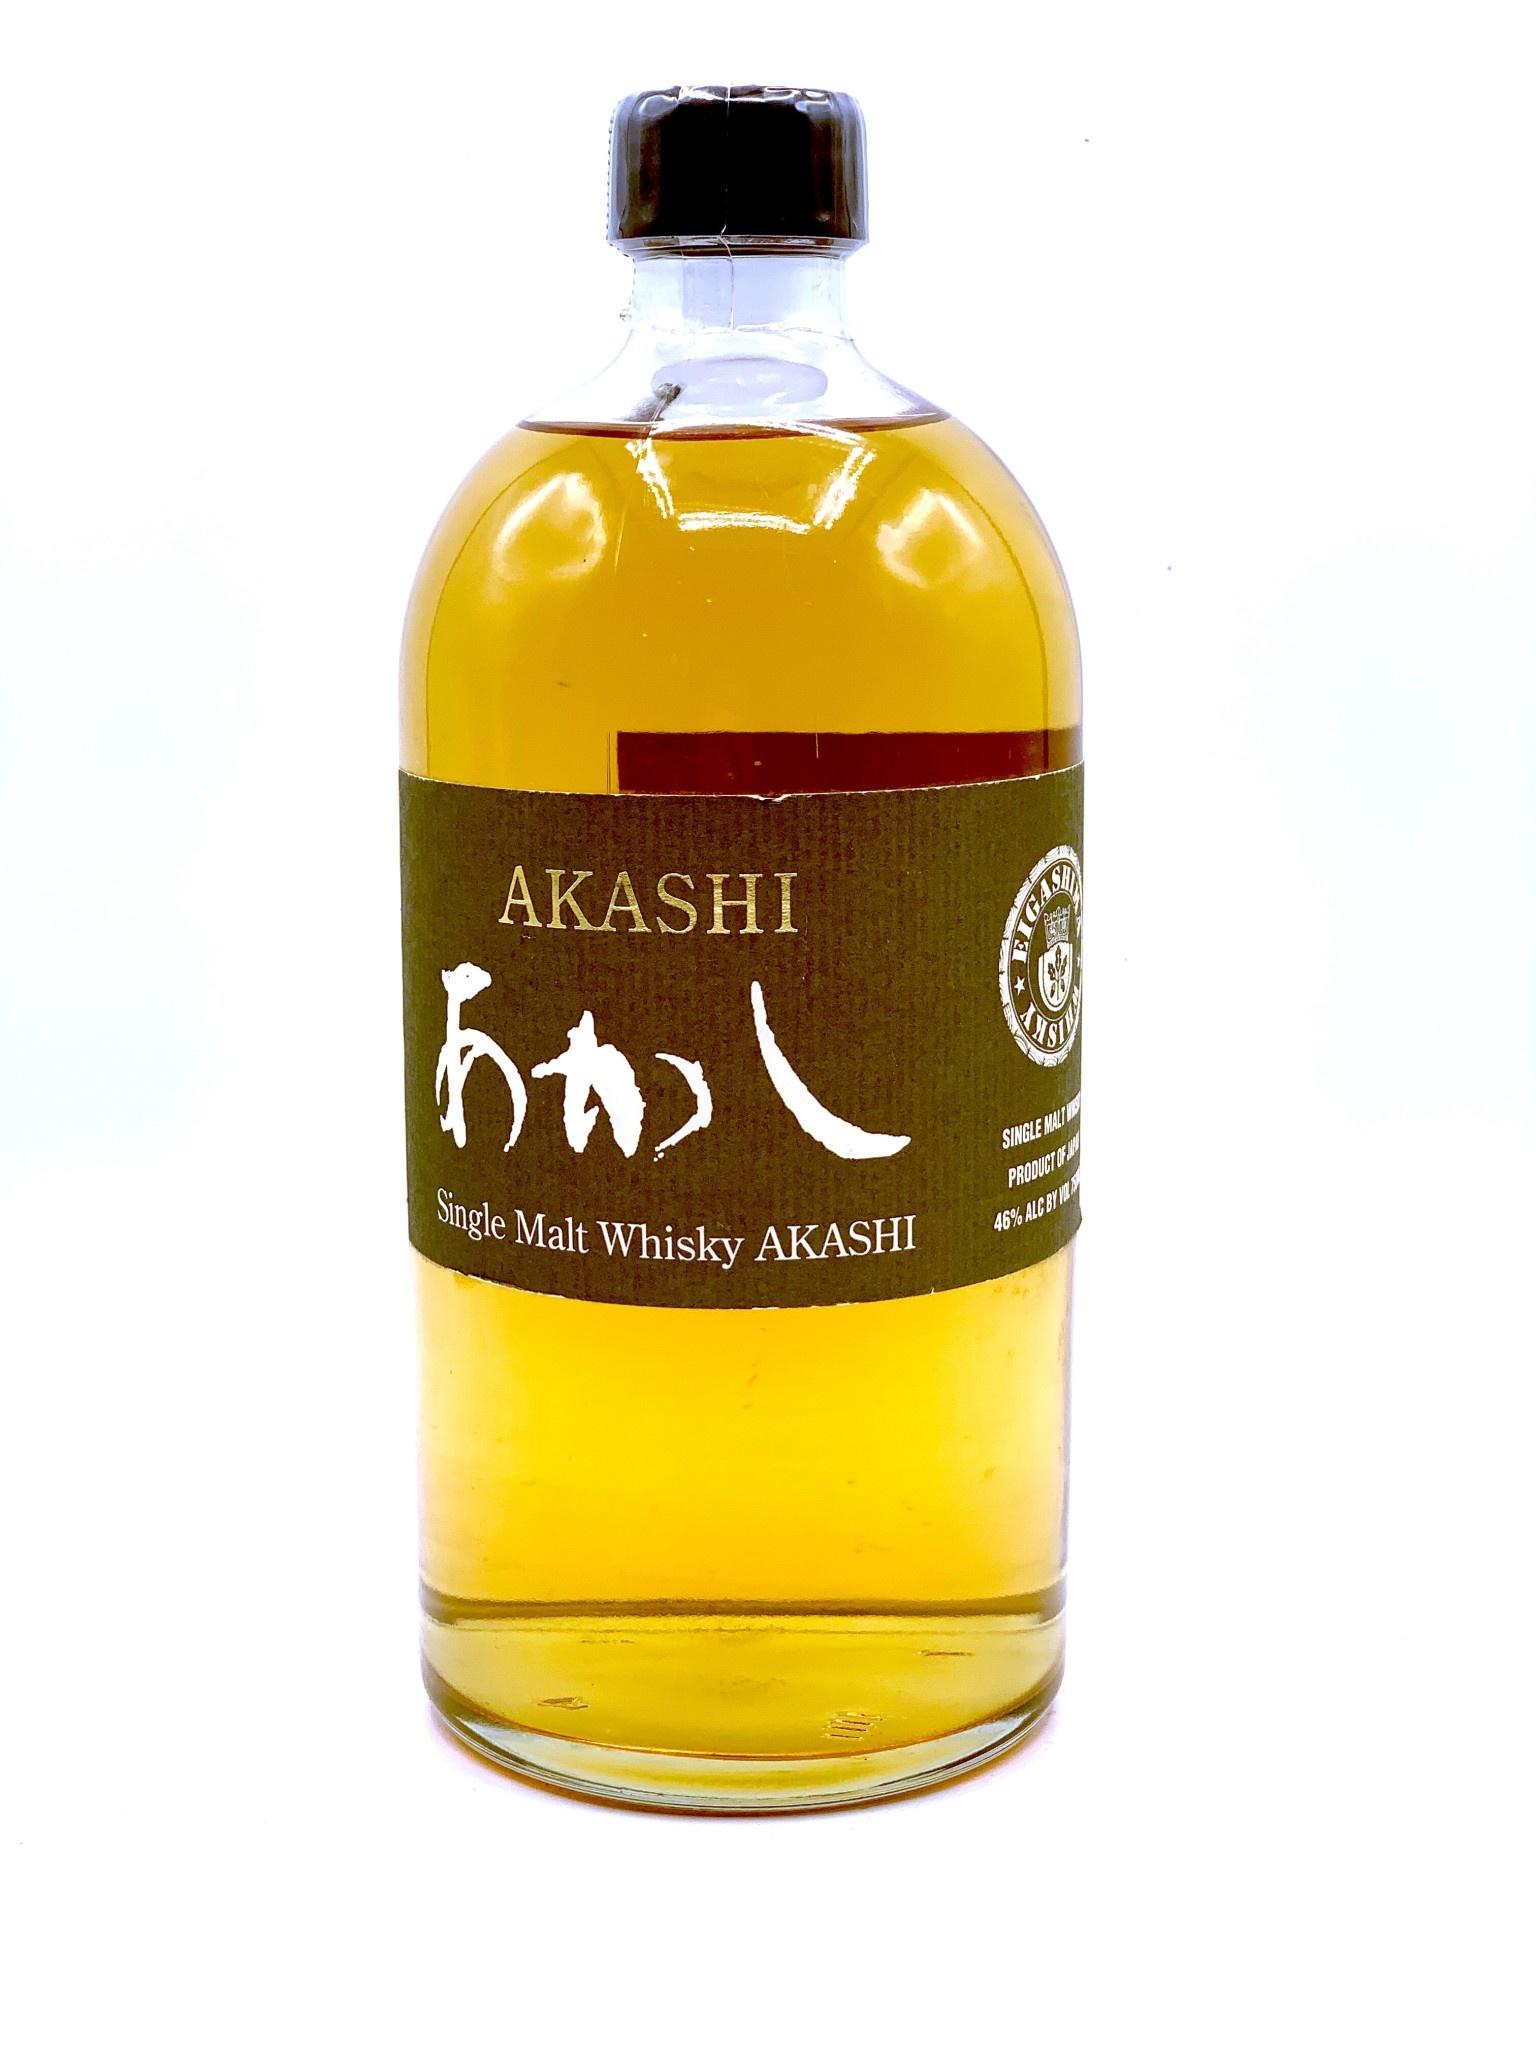 Akashi Shuzo Single Malt Whisky White Oak Distillery  750ml (92 proof)